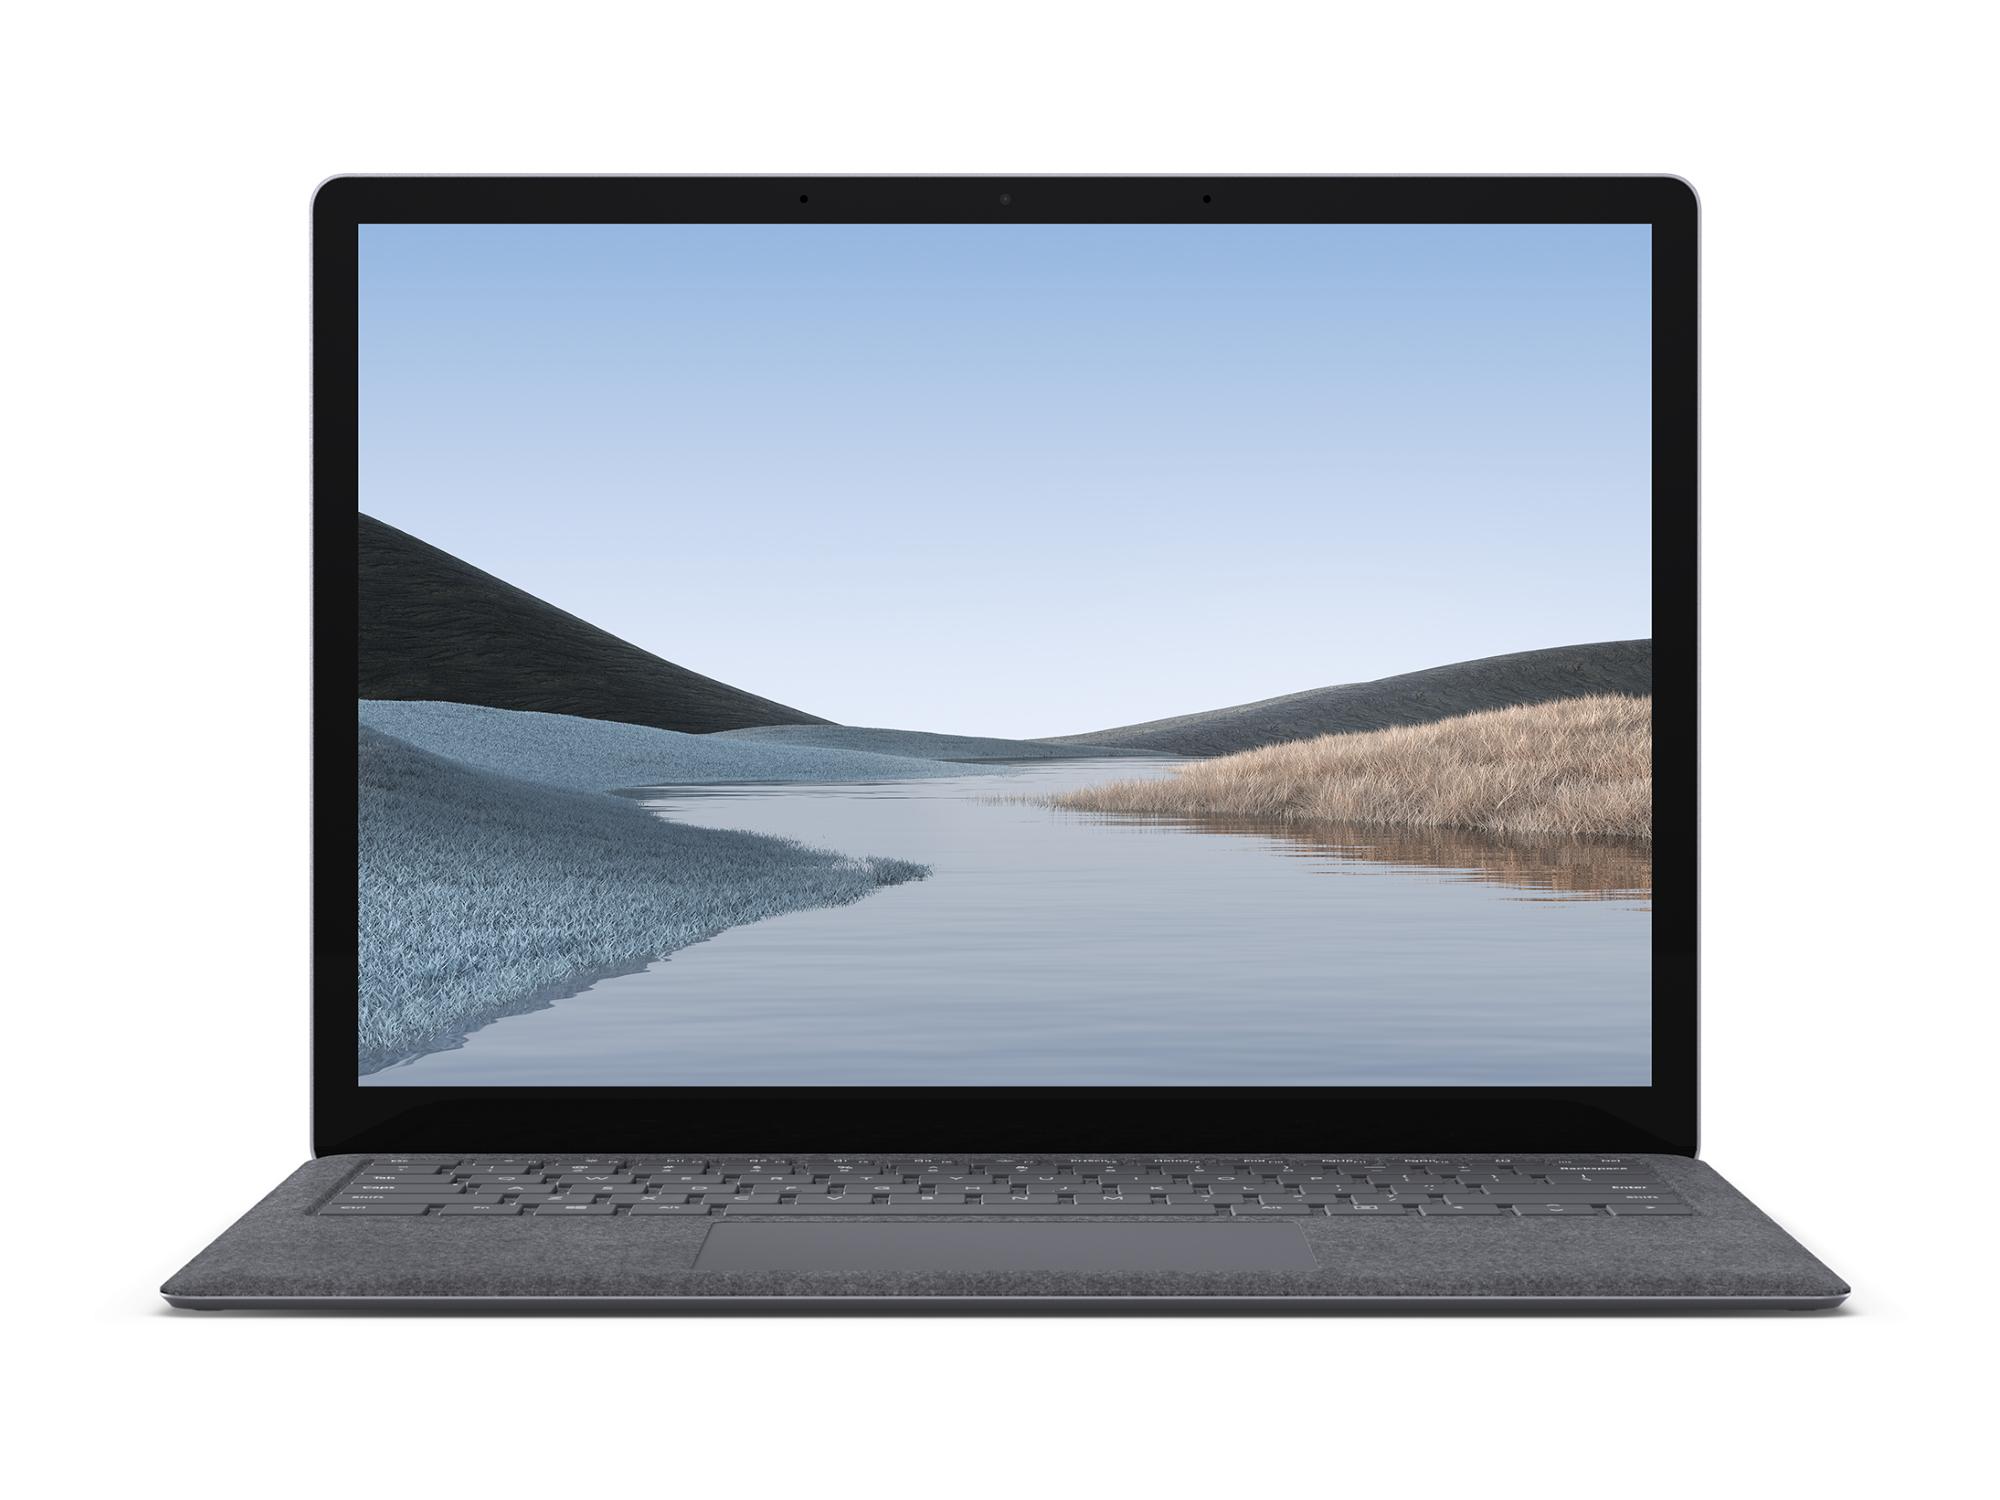 "Microsoft Surface Laptop 3 Portátil Platino 34,3 cm (13.5"") 2256 x 1504 Pixeles Pantalla táctil Intel® Core™ i5 de 10ma Generación 8 GB LPDDR4x-SDRAM 256 GB SSD Wi-Fi 6 (802.11ax) Windows 10 Pro"